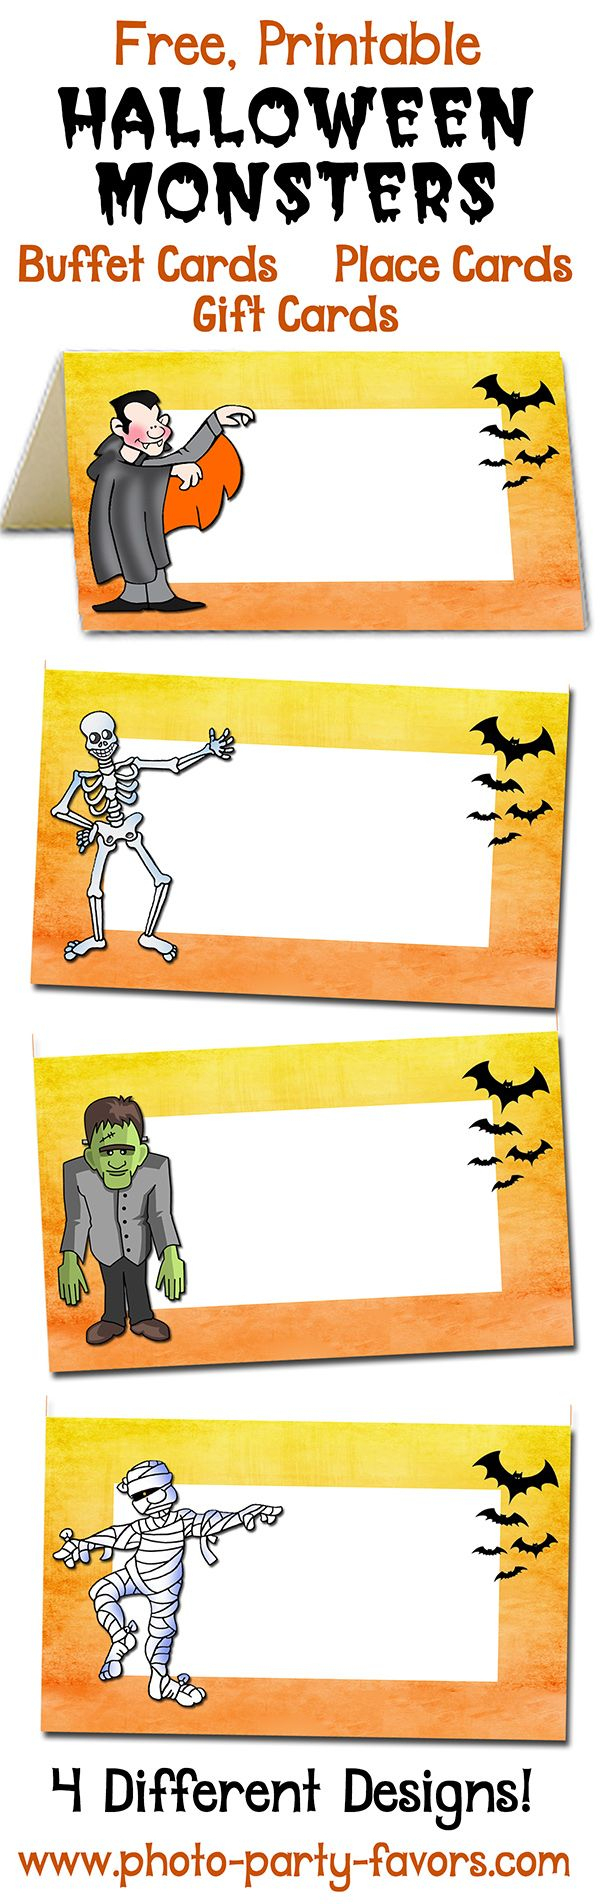 Pinchristi Pew On Hosa Blood Drive   Halloween Buffet, Halloween - Free Printable Halloween Place Cards